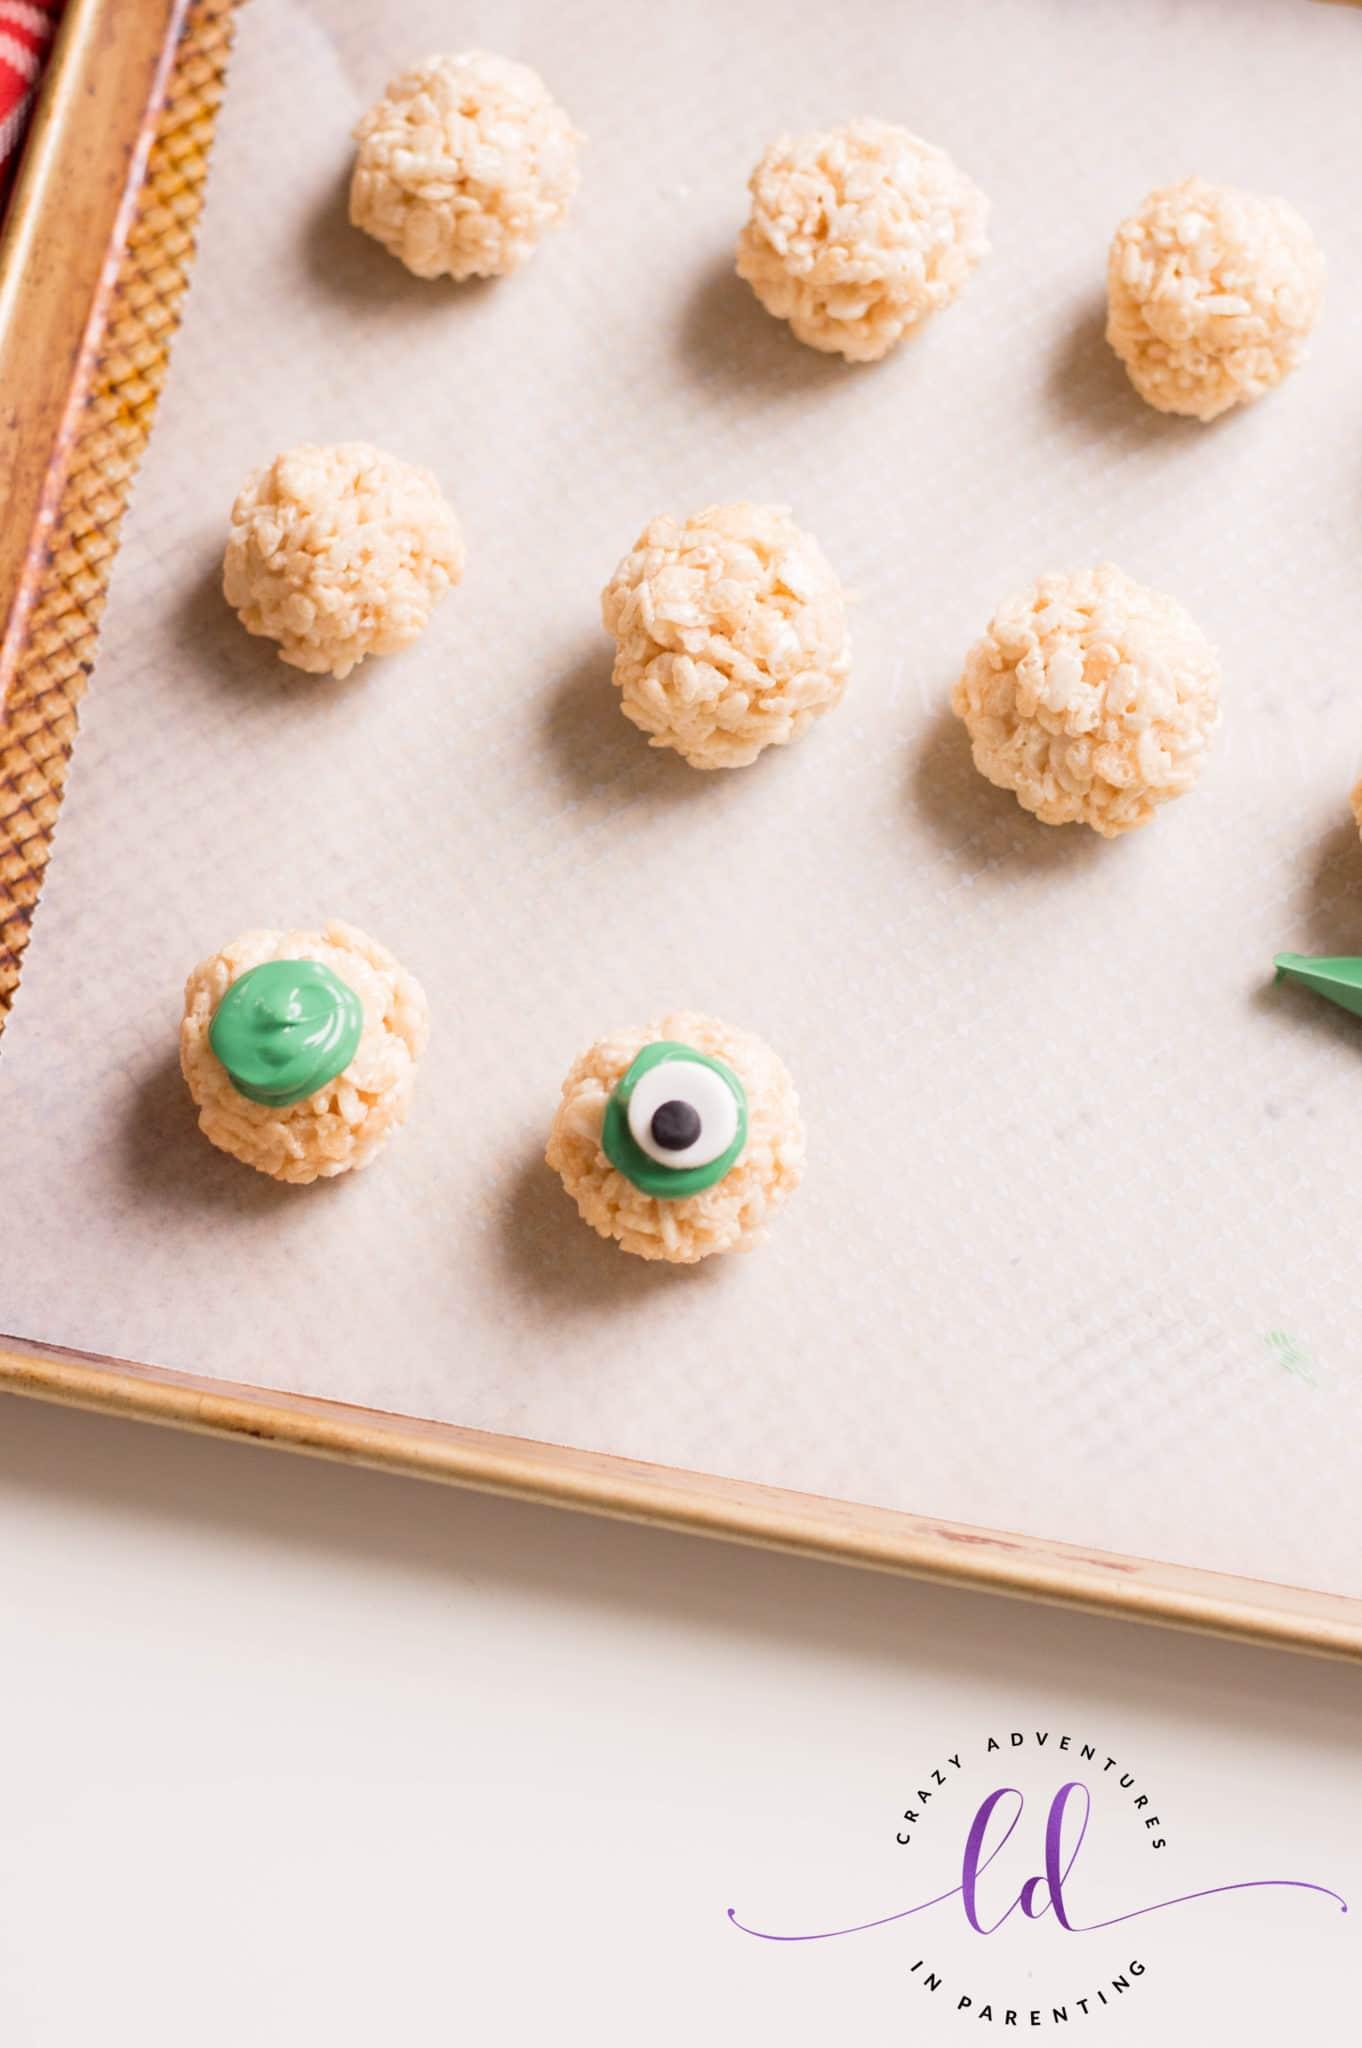 Pipe Green Candy onto Eyeball to Make Halloween Eyeballs Rice Krispies Treats